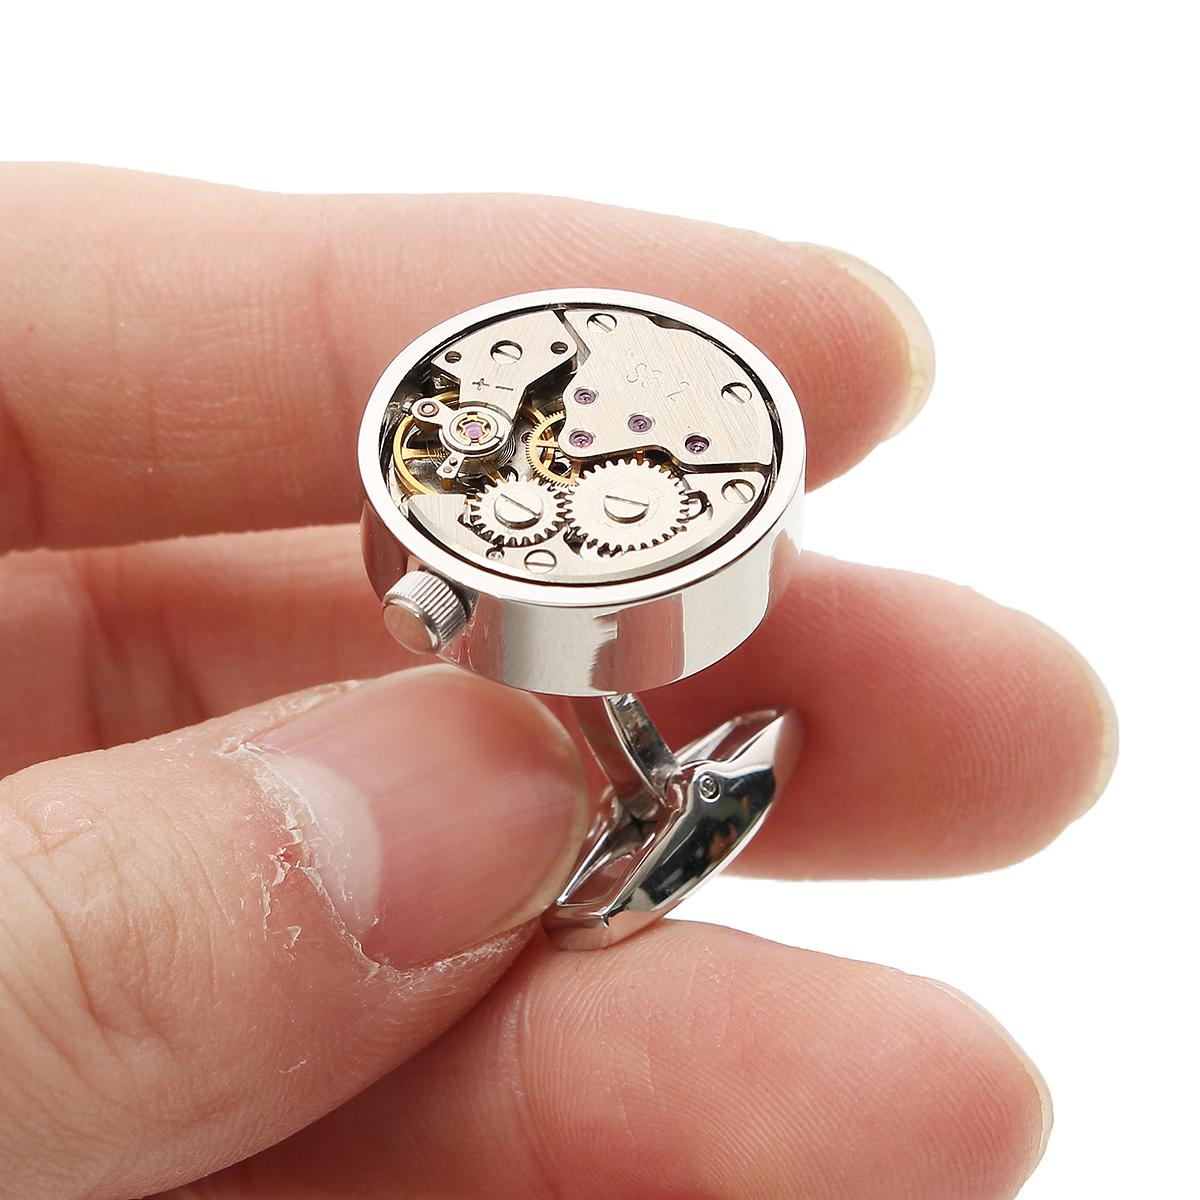 Mens Silver Mechanical Watch Pattern Bare Cufflinks Wedding Gift Suit Shirt Accessories